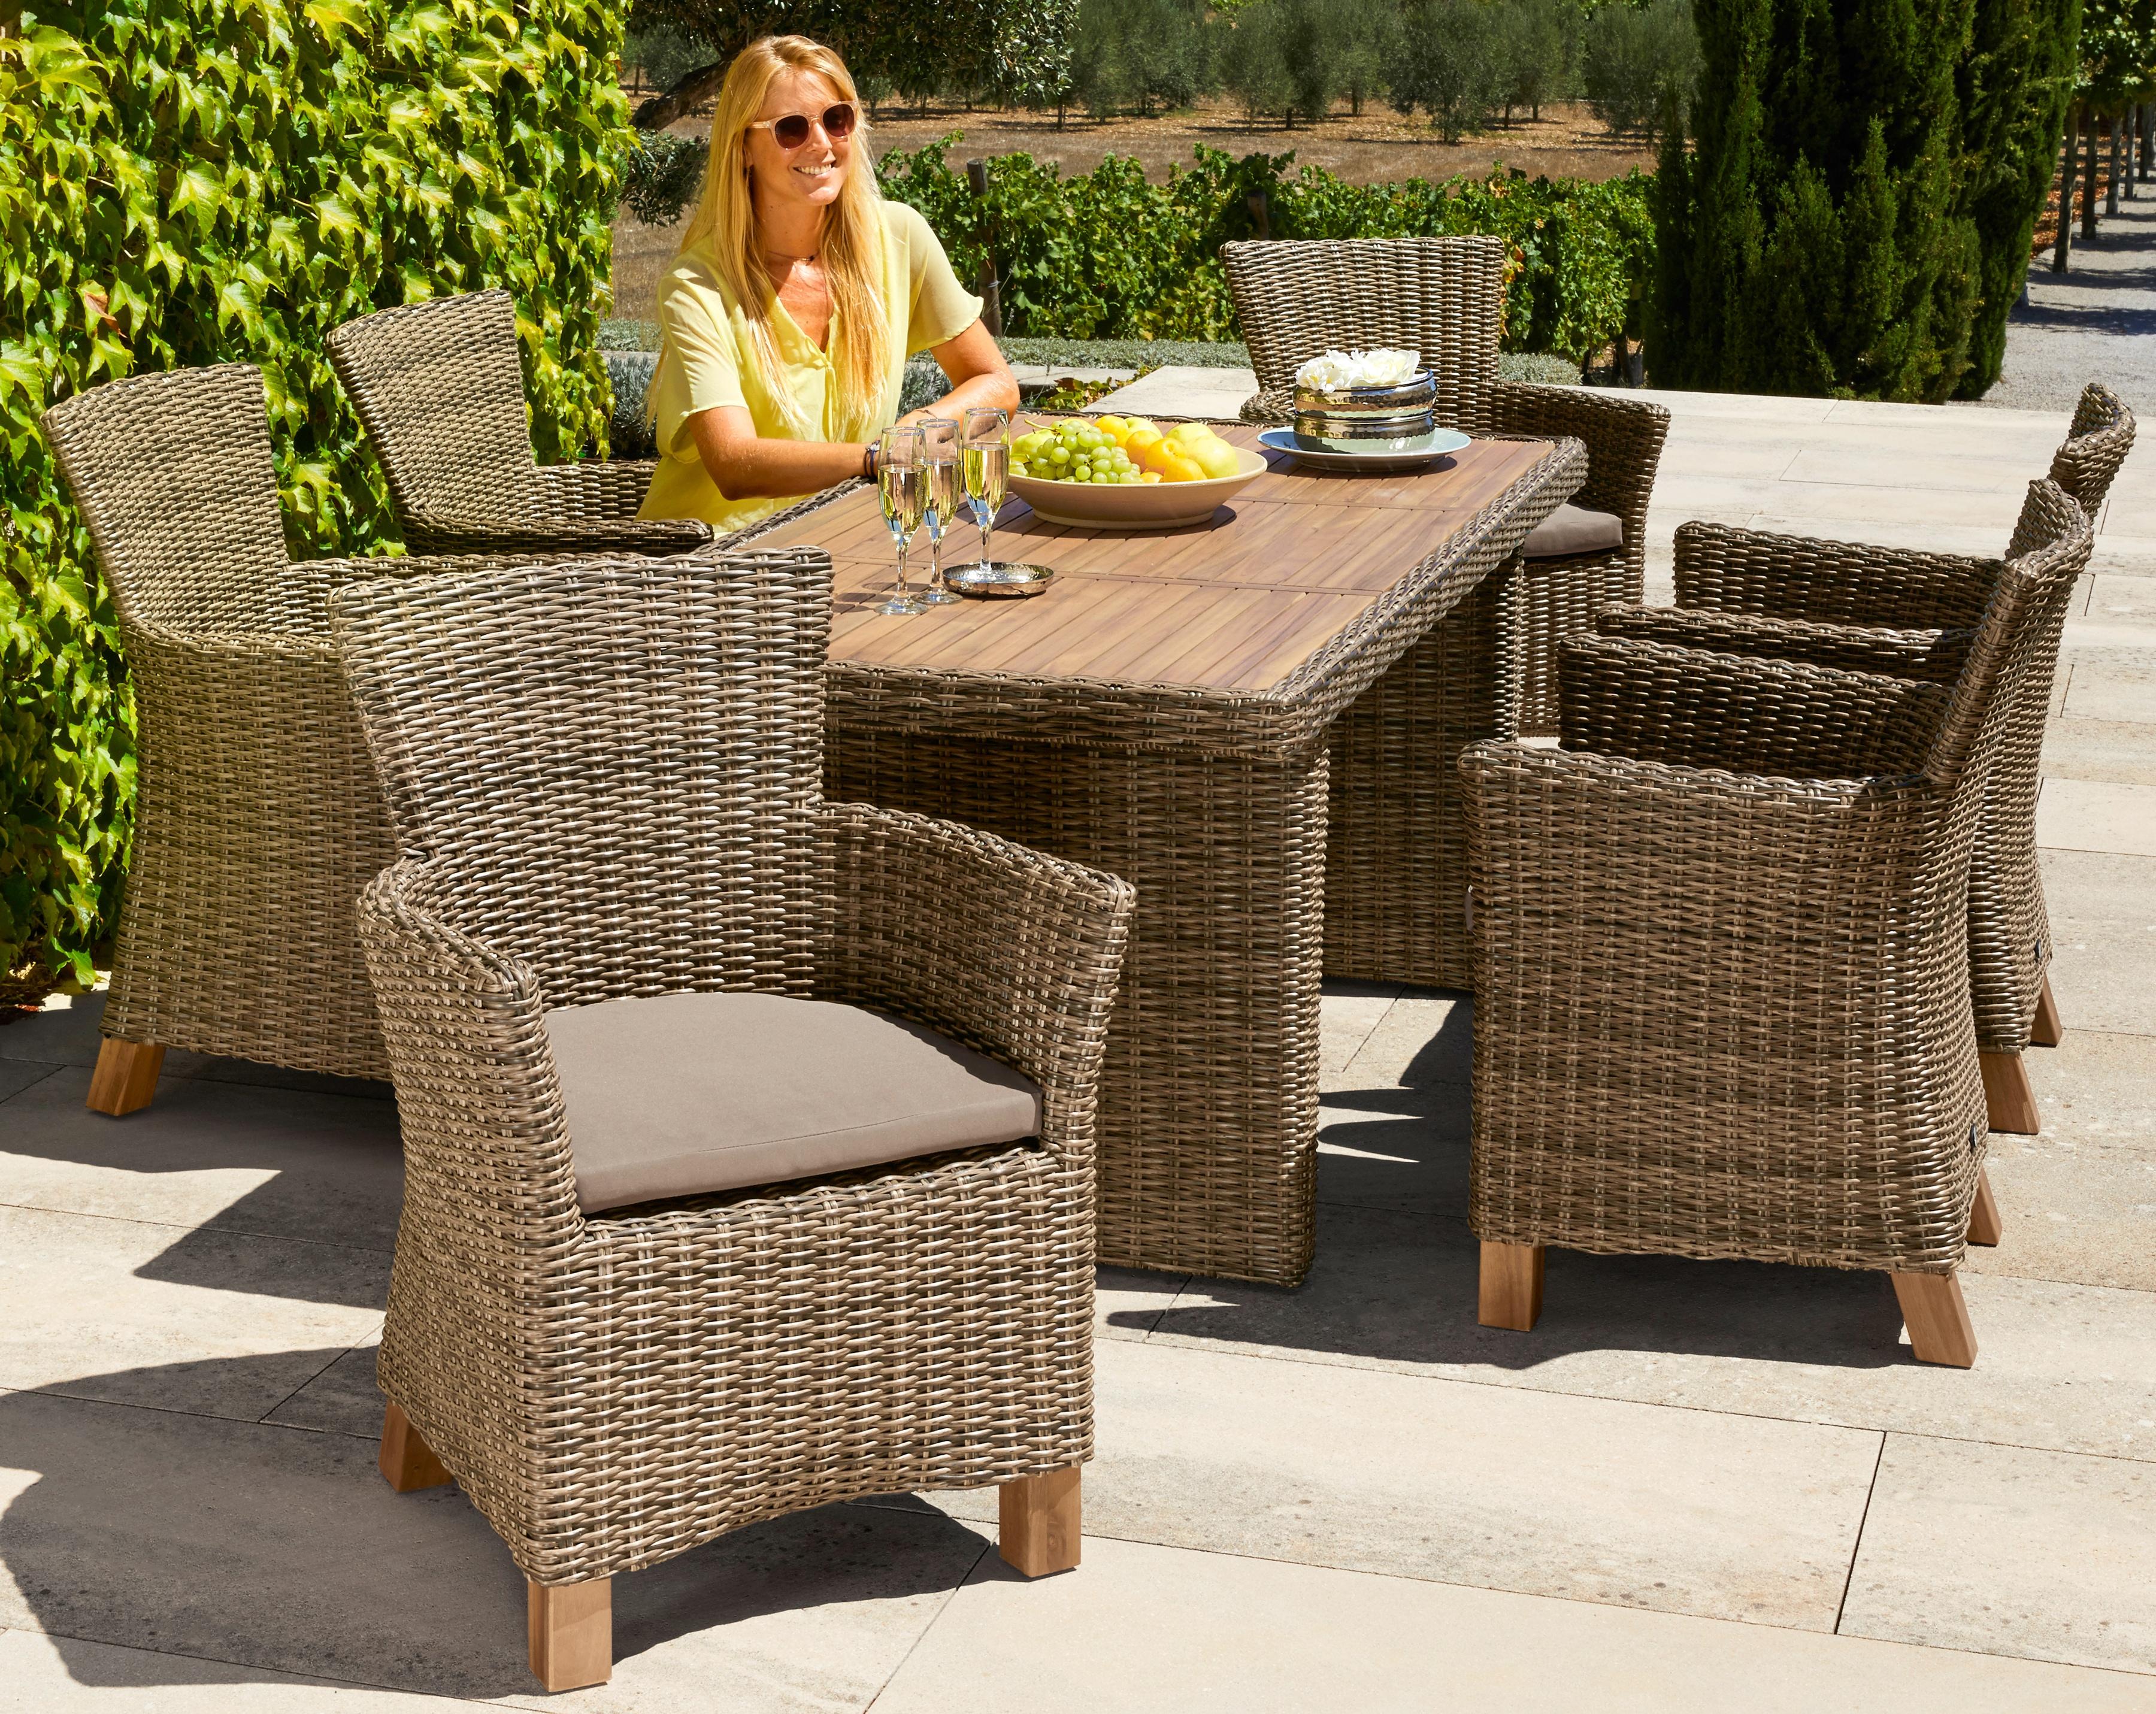 MERXX Gartenmöbelset Toskana 13-tlg 6 Sessel Tisch 185x90 cm Polyrattan/Akazie